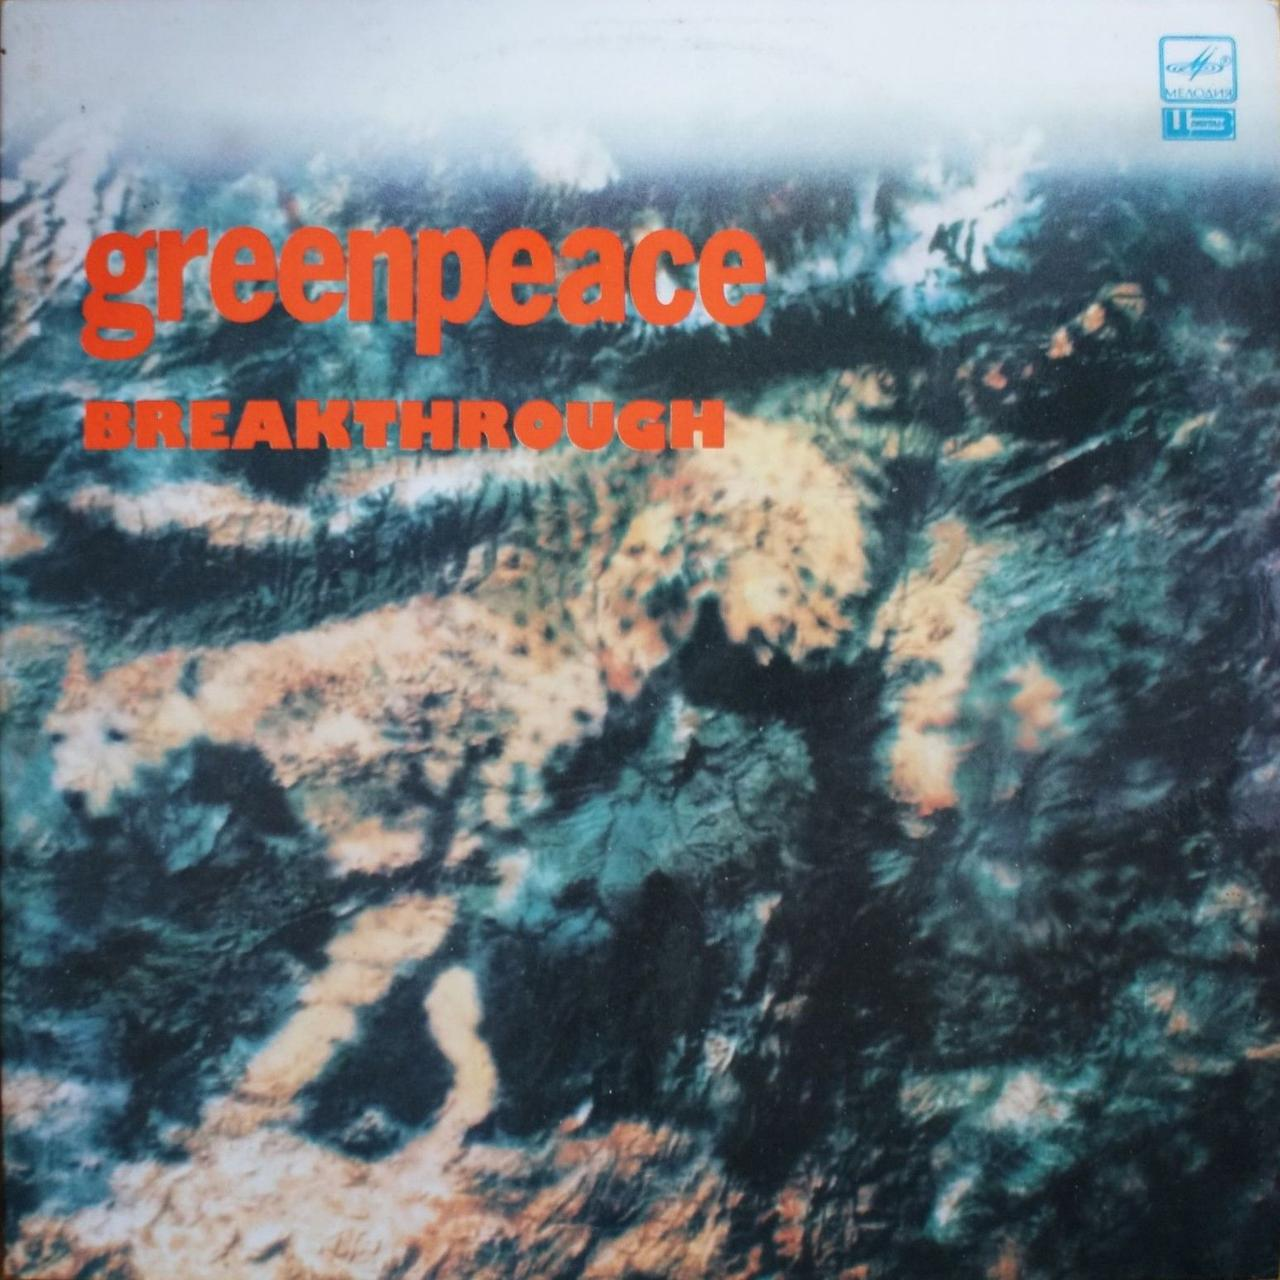 Пластинка виниловая Greenpeace - Breakthrough